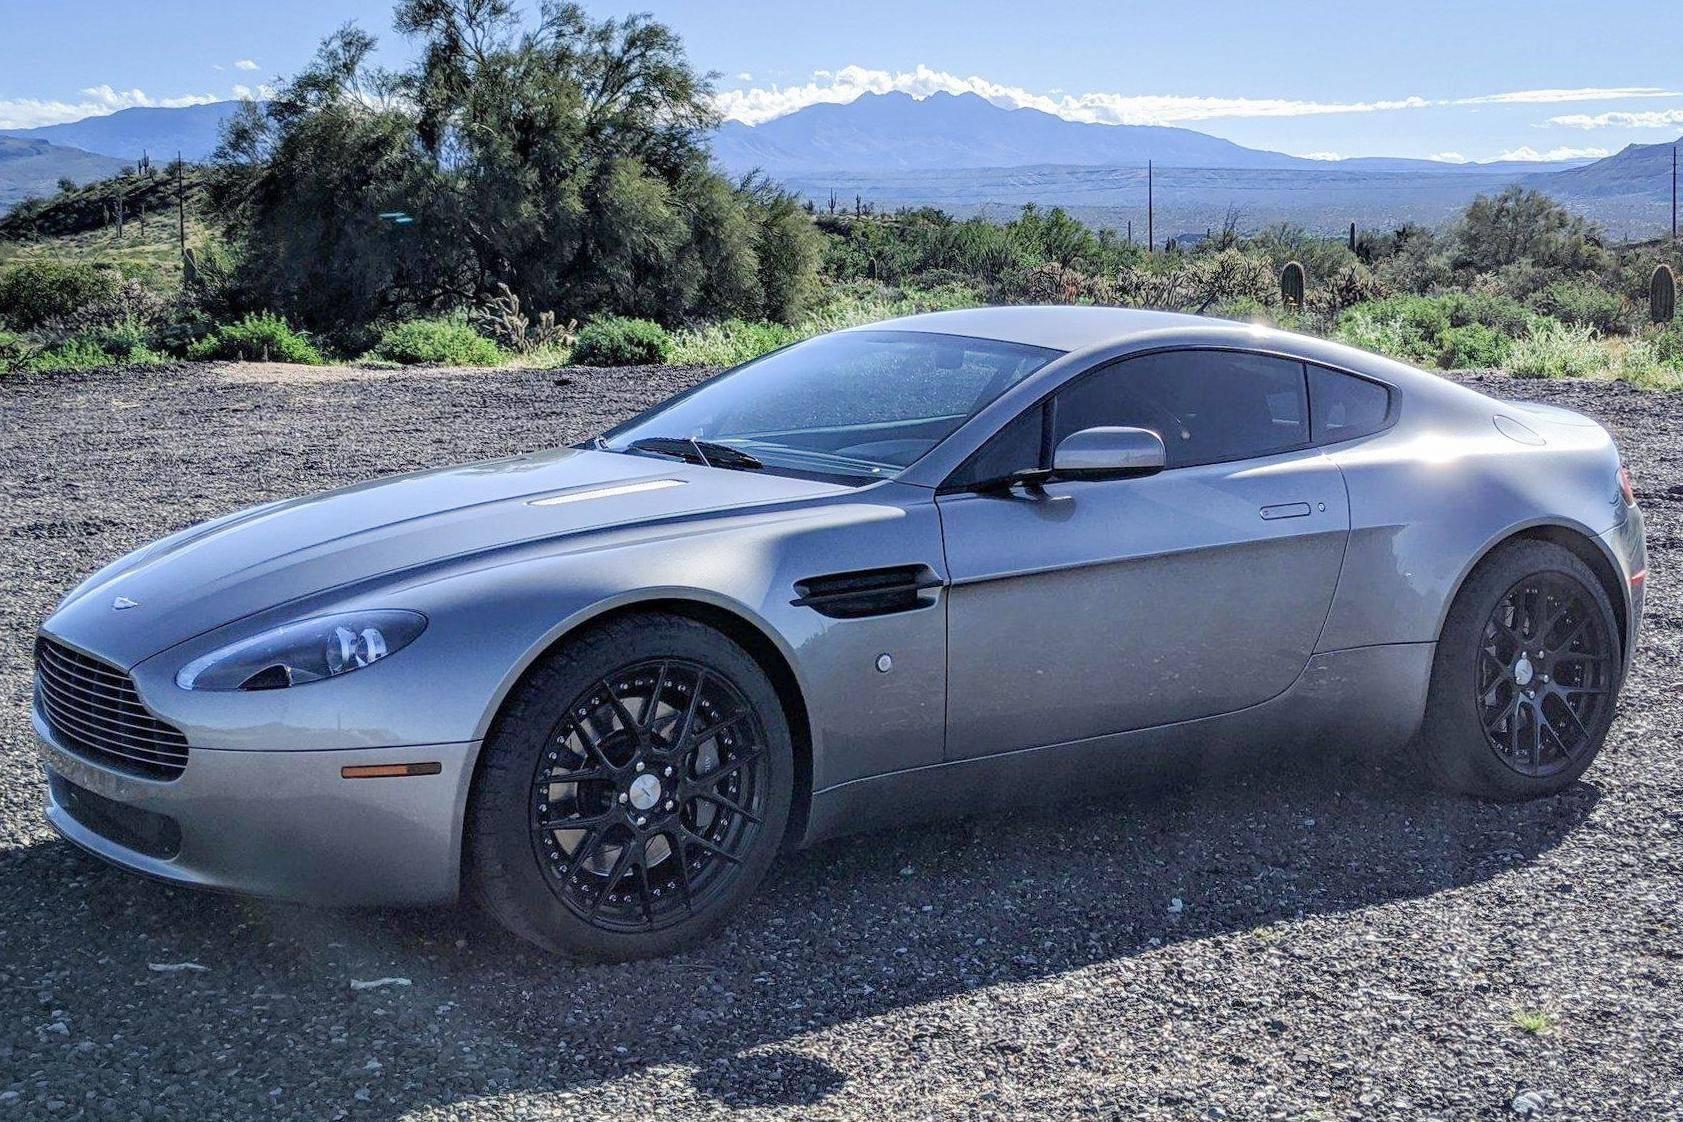 2007 Aston Martin V8 Vantage Auction Cars Bids